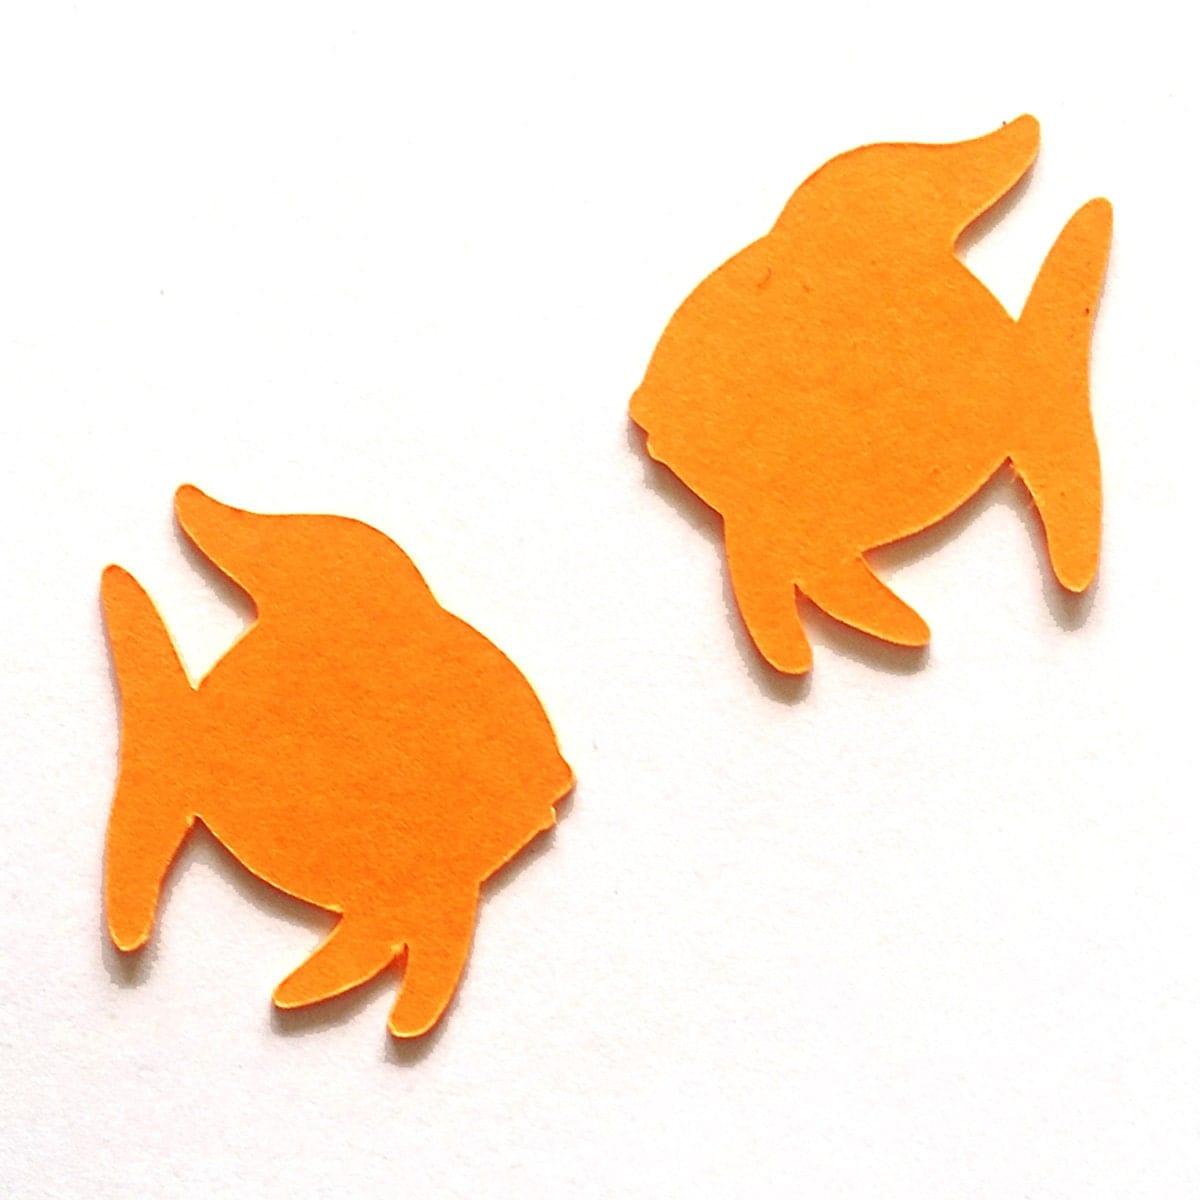 25 pack paper fish shape fish die cut fish cut outs paper